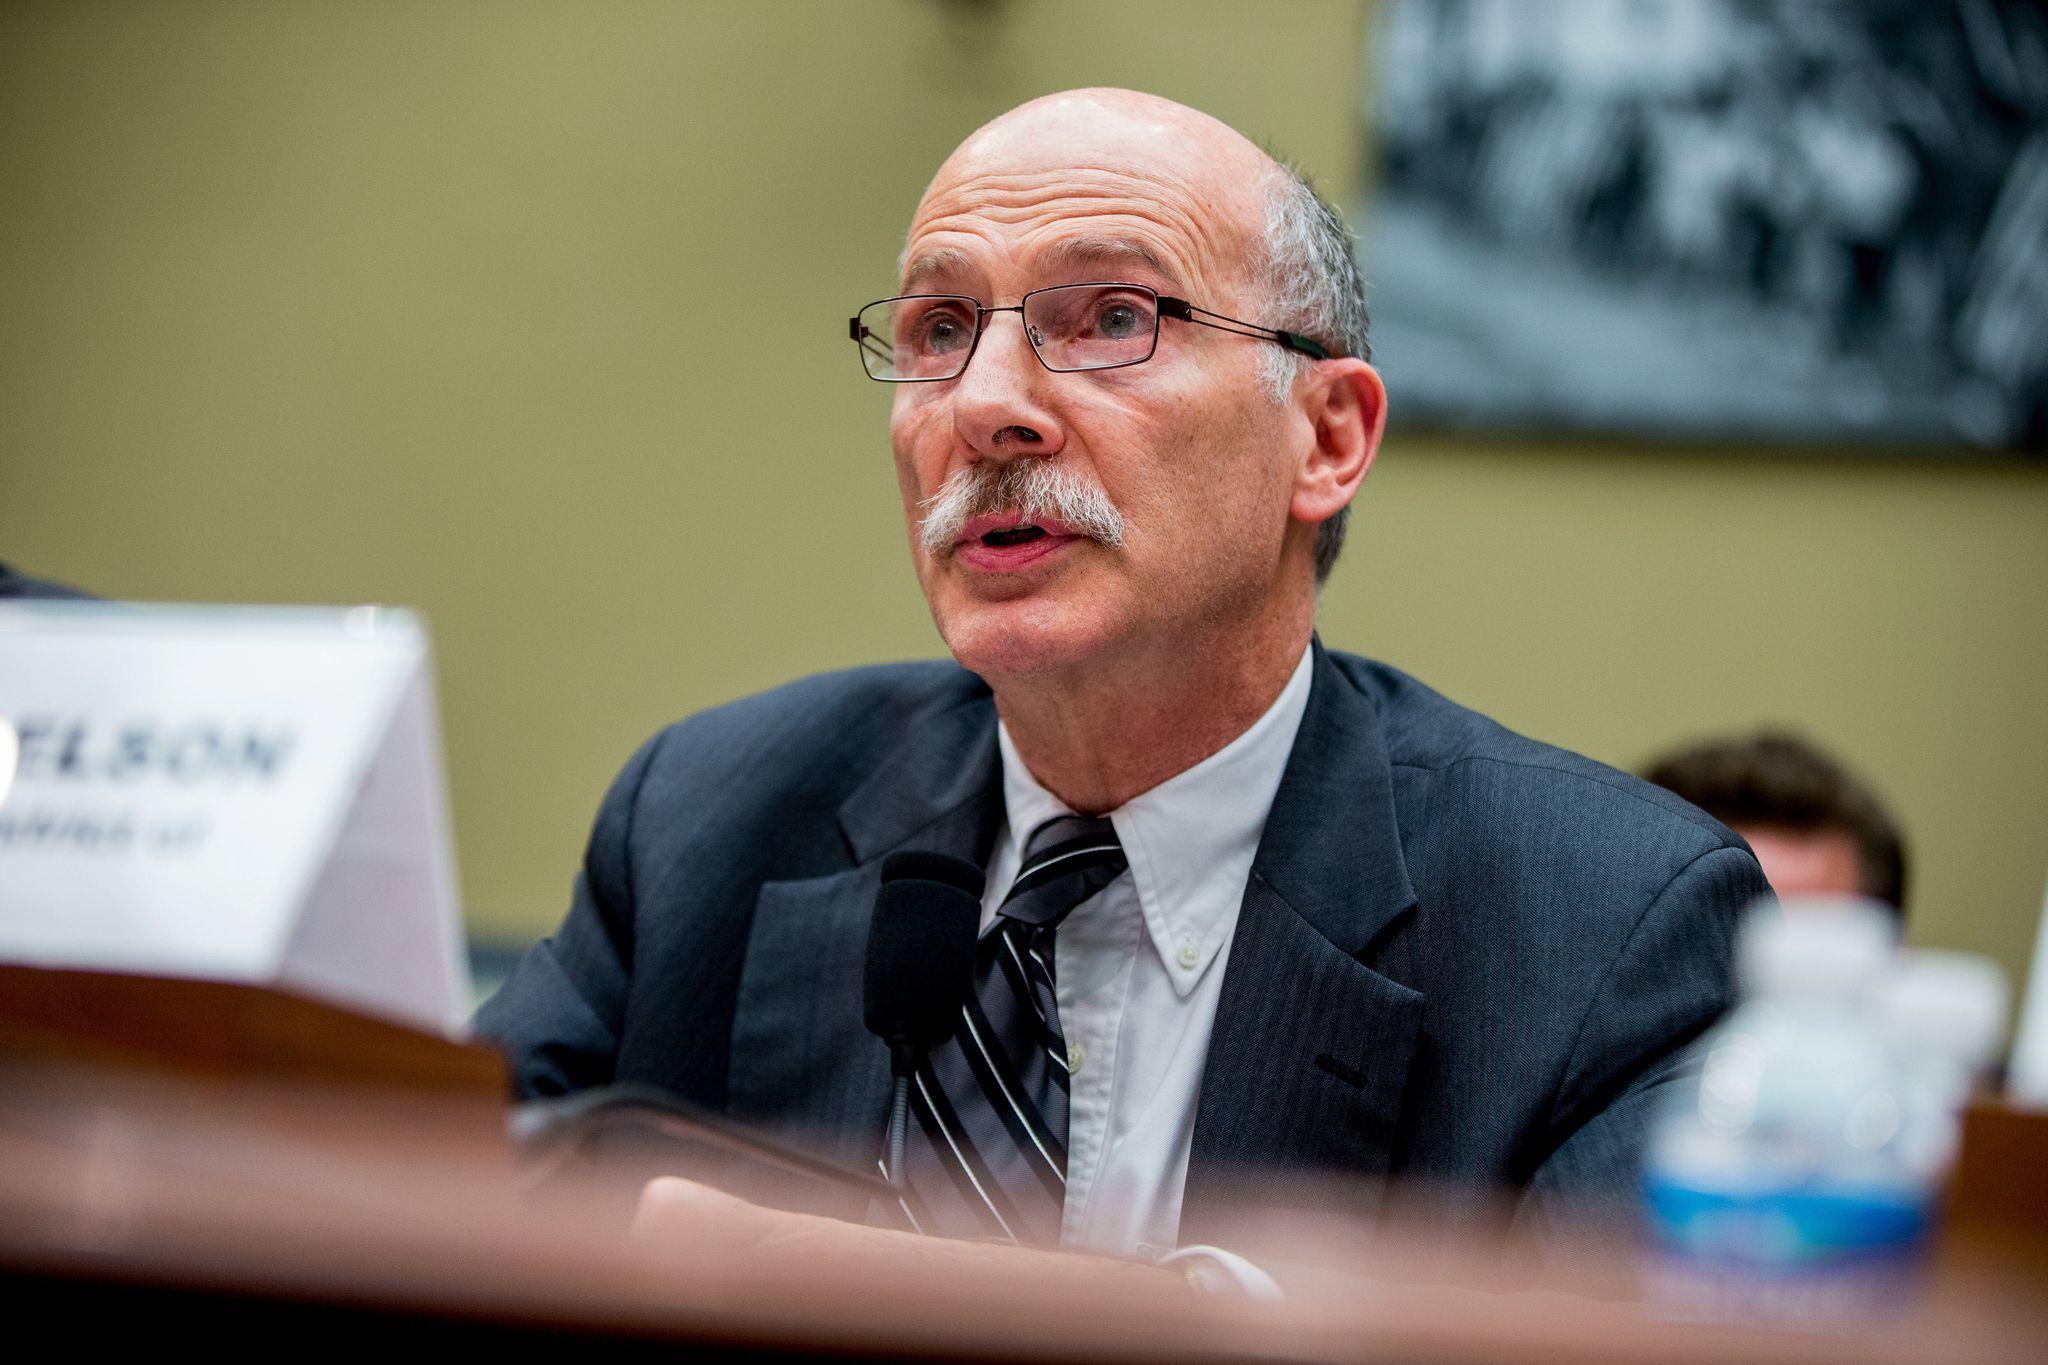 D.C. Council approves $15.5 billion budget for fiscal 2020